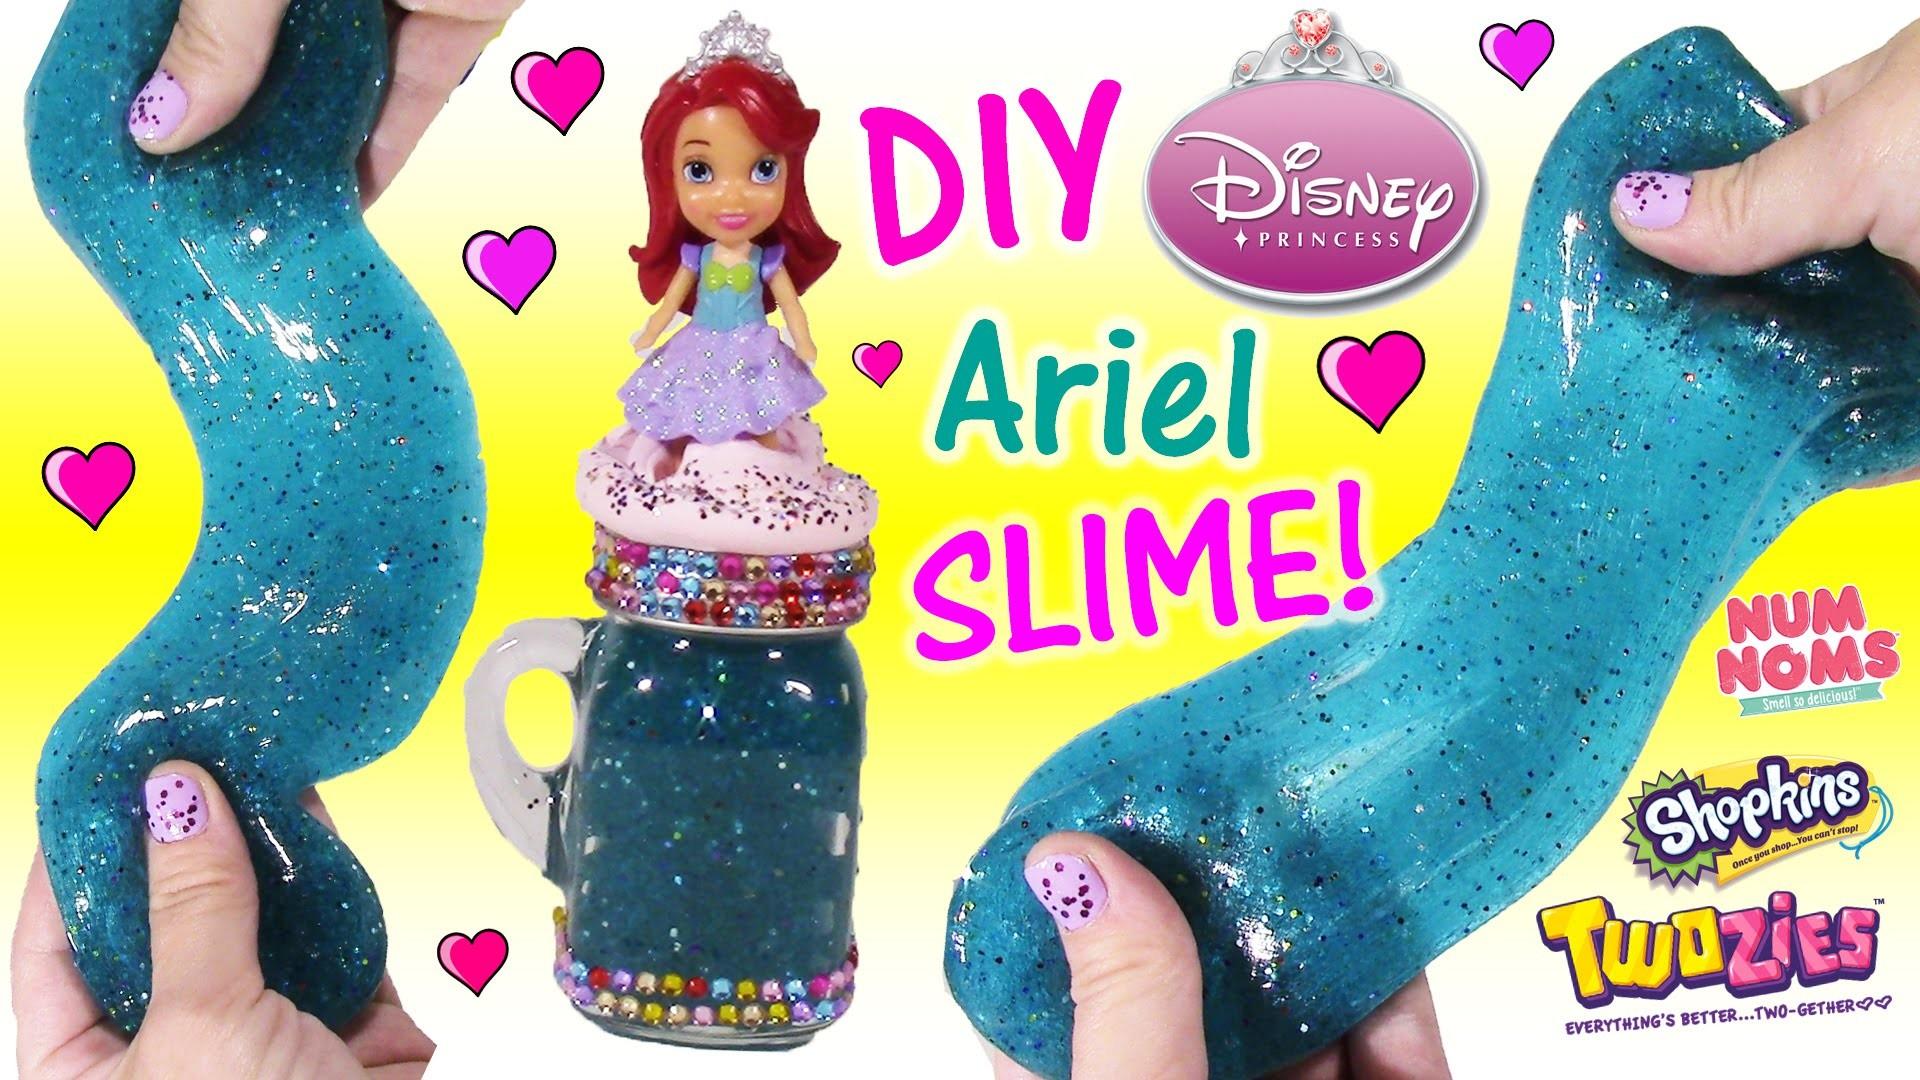 DIY Disney Princess ARIEL Glitter SLIME! Make Your Own Squishy Putty & Cute Jar! Happy Places! FUN